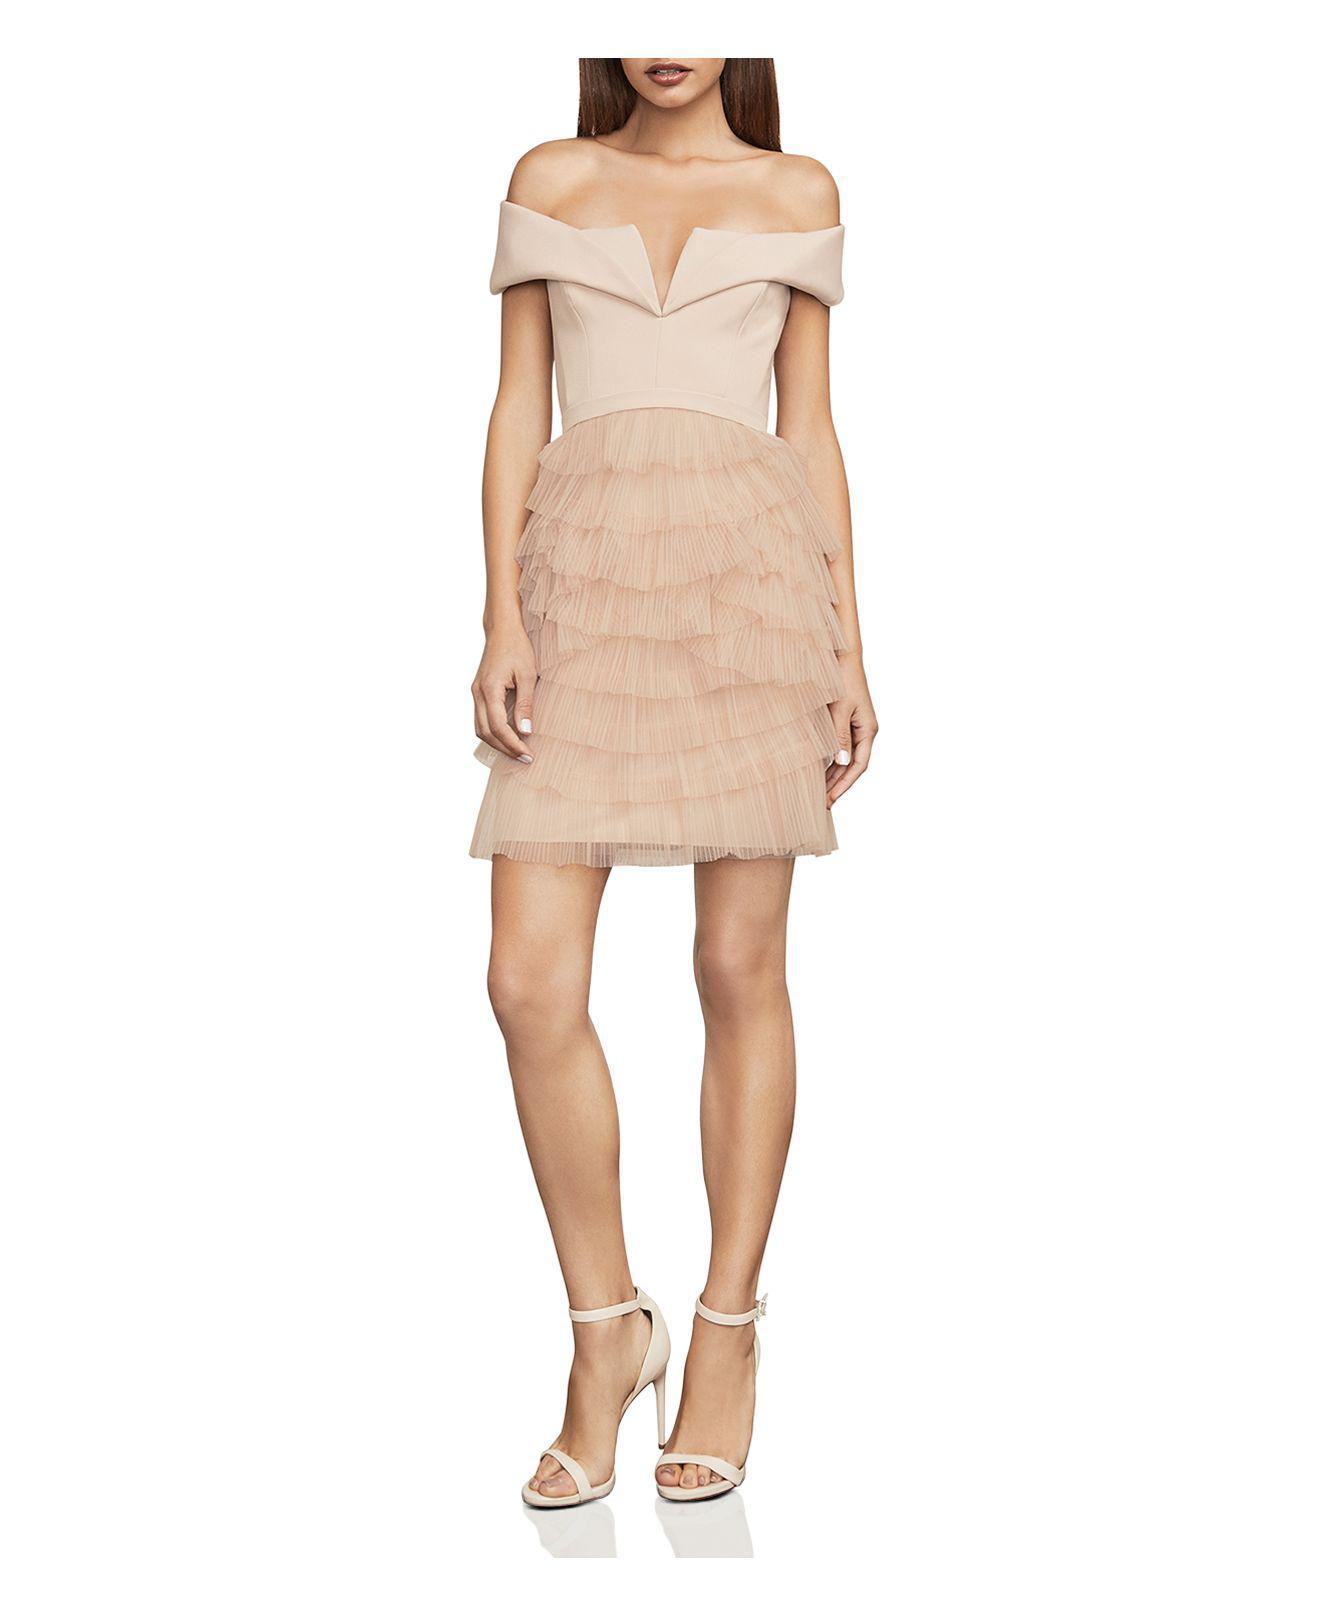 9b8cf1badbb8 Lyst - BCBGMAXAZRIA Marquise Ruffled Off-the-shoulder Dress in Pink